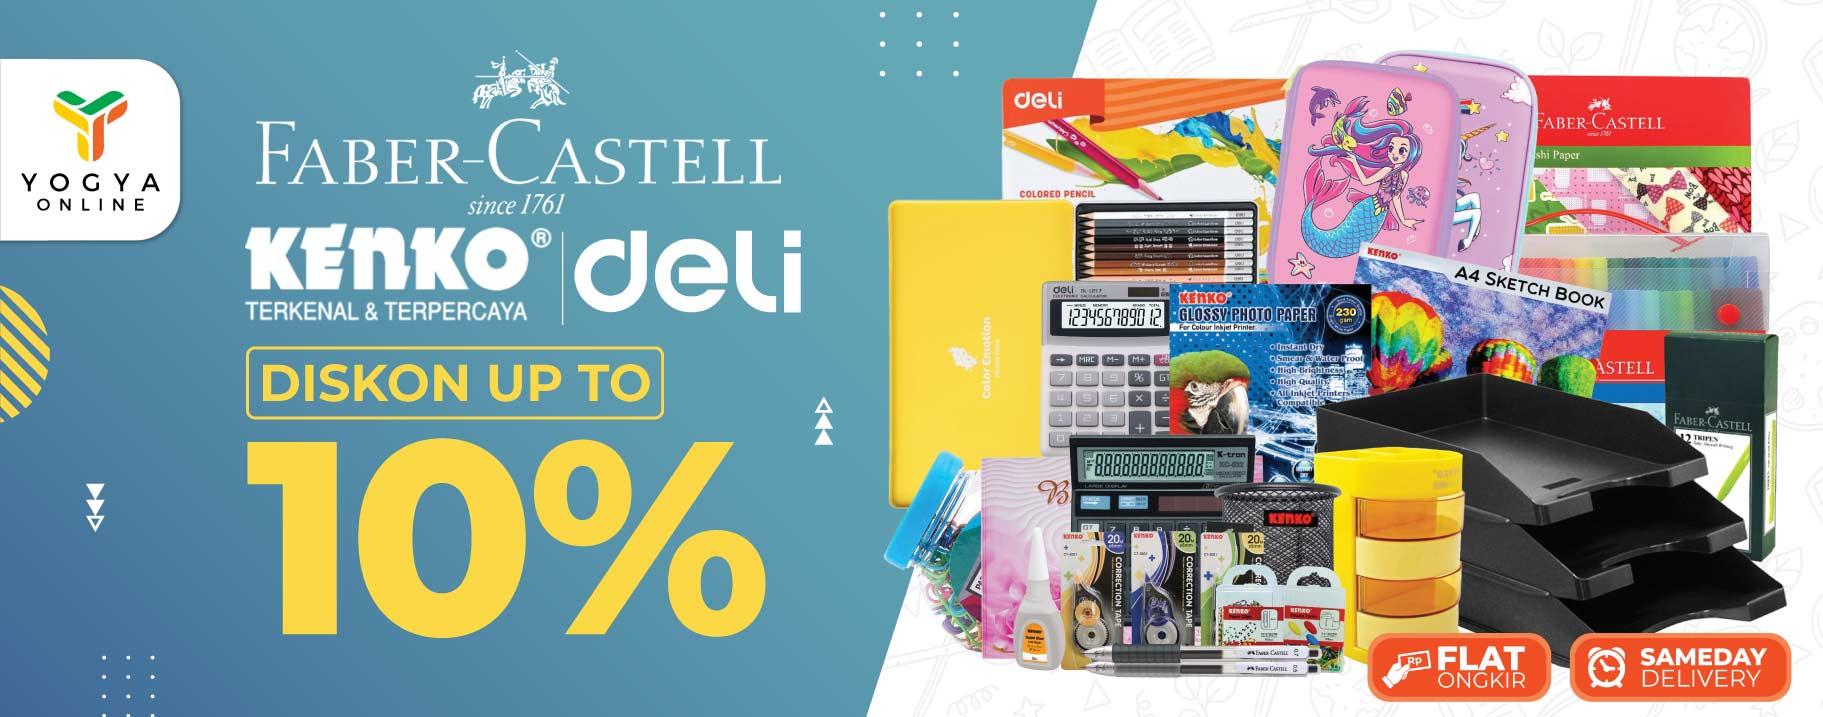 Deli, Kenko & Faber Castell